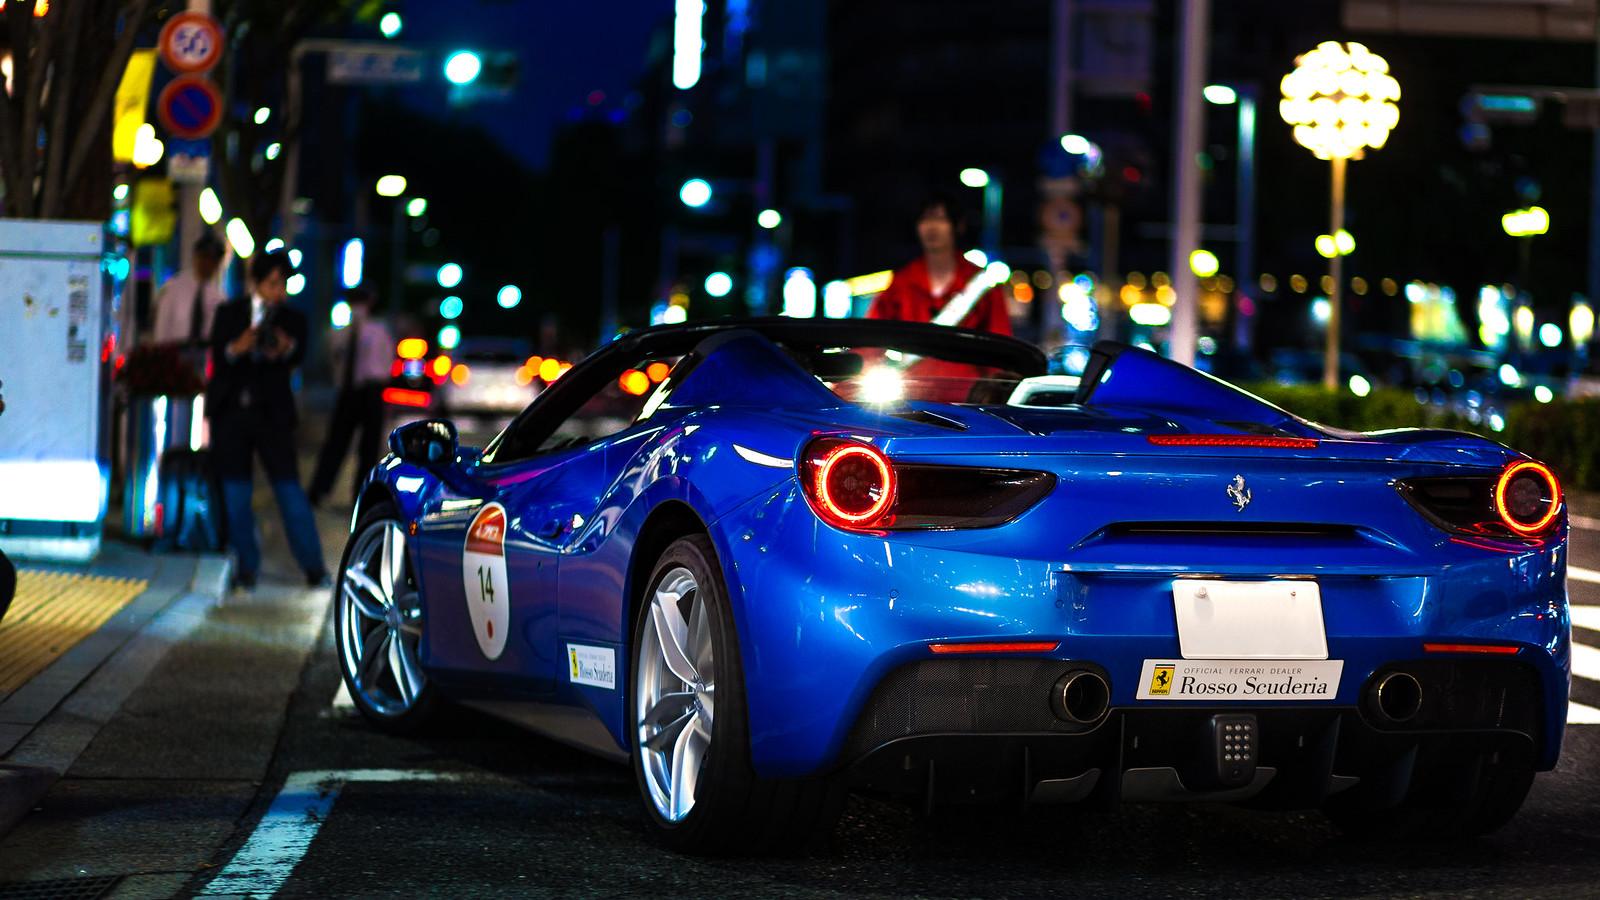 Ferrari 70th anniversary in Japan - 488spider